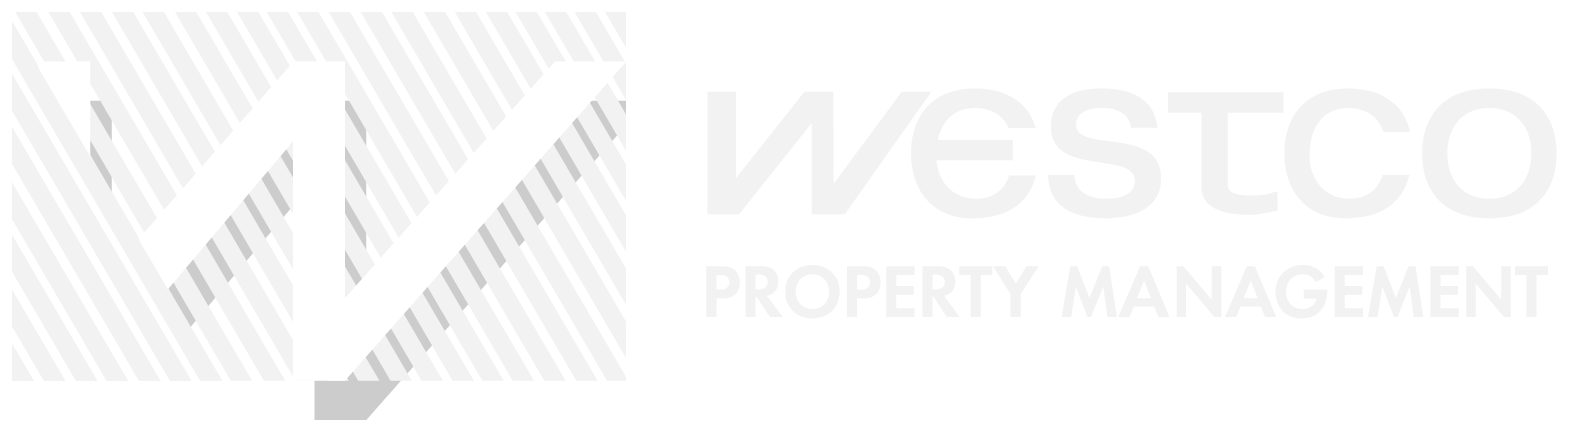 Westco Property Management